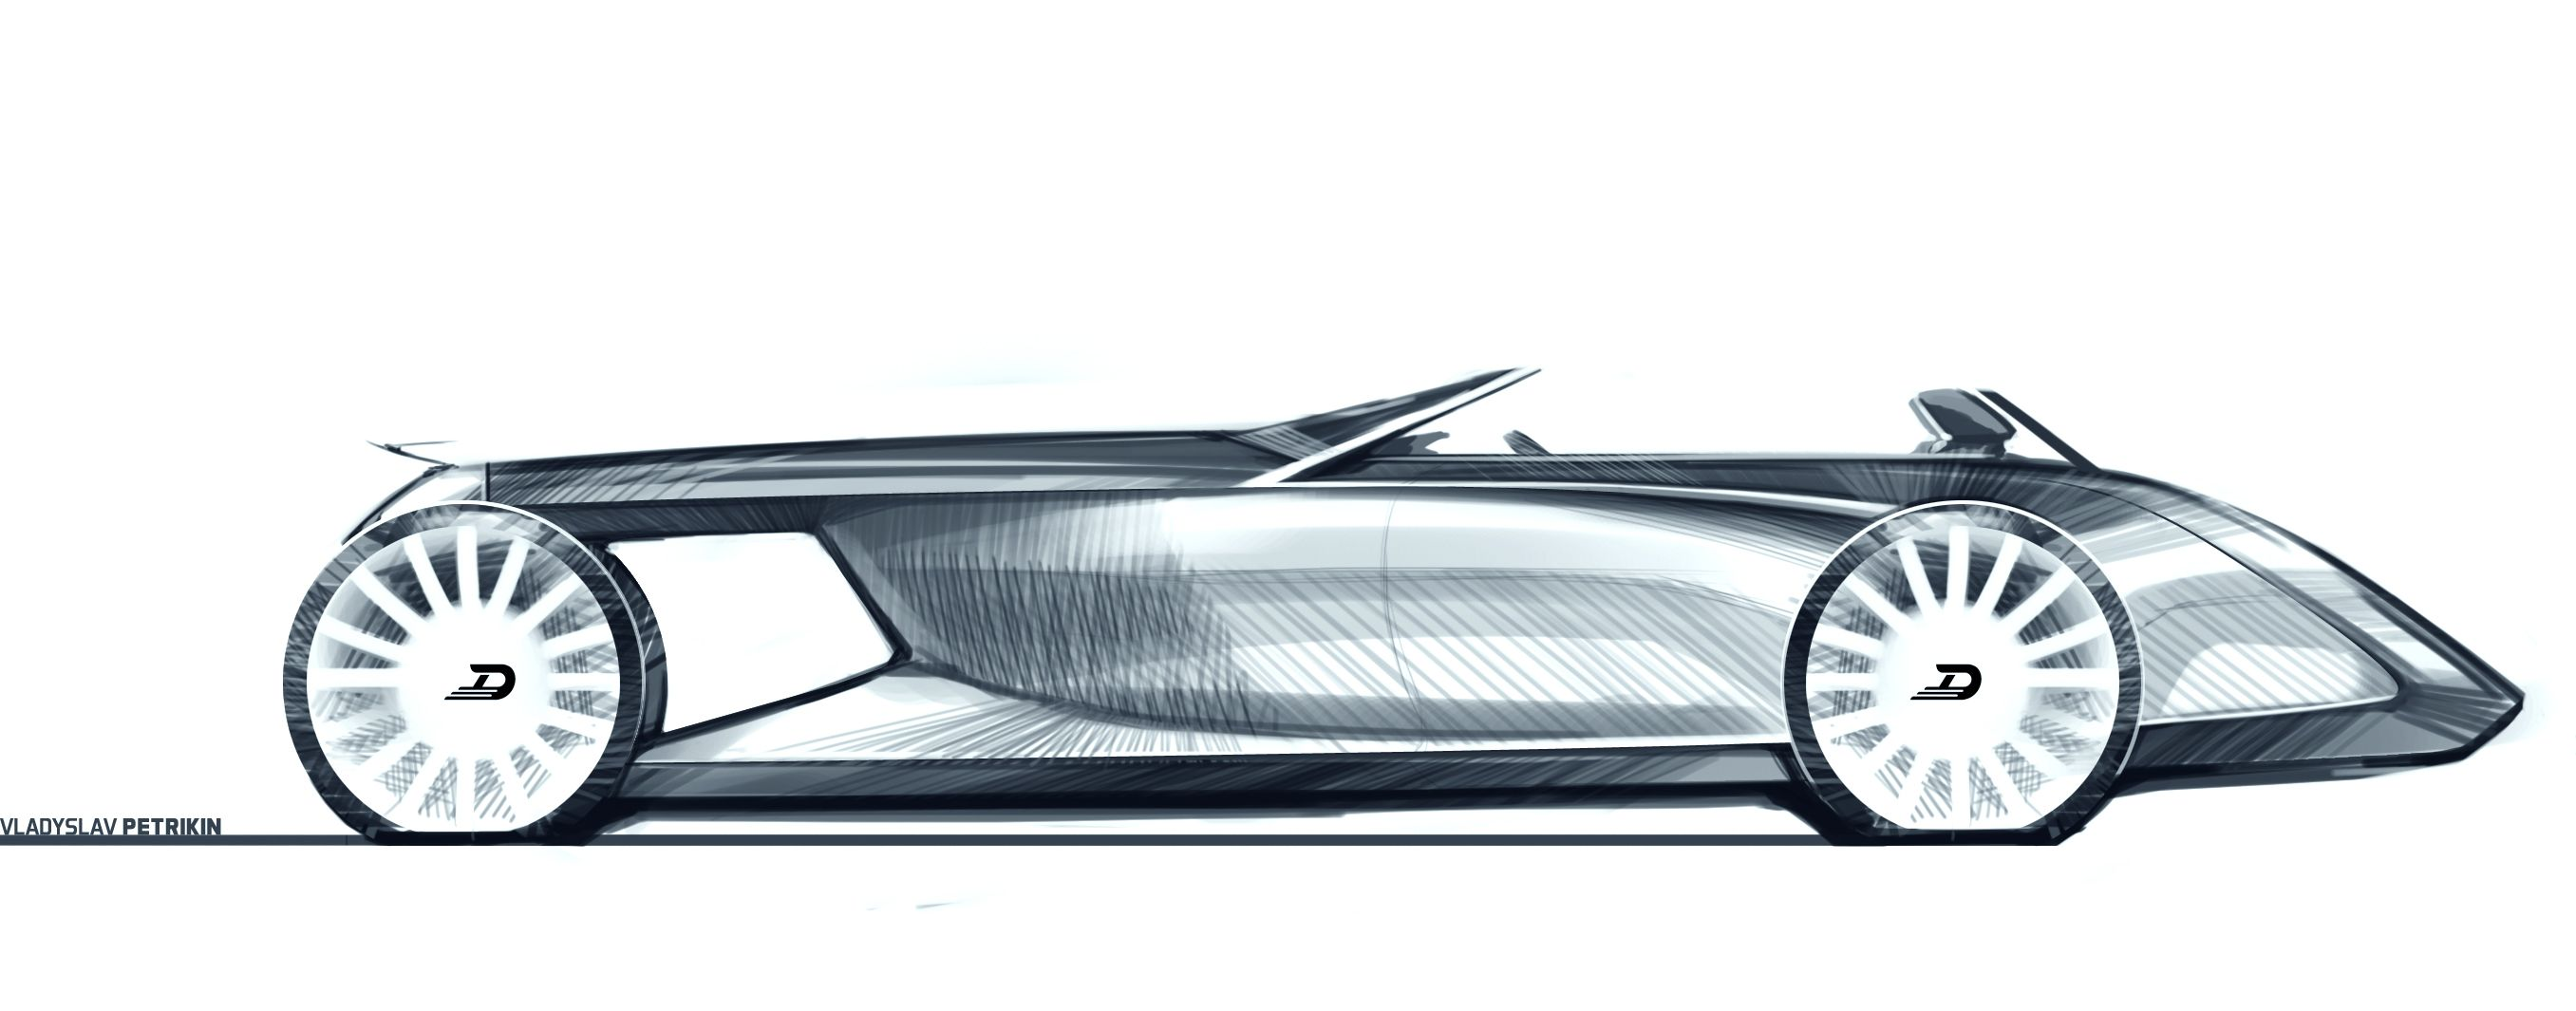 Duesenberg J Convertible Coupe #DuesenbergDesignChallenge, #cardesign, #design, #automotivedesign, #transportdesign, #vehicledesign, #industrialdesign, #productdesign, #doodle, #cardrawing, #sketch, #carsketch, #concept, #art, #wheels, #photoshop, #sport, #drawing, #electric, #engine, #dailysketch, #supercar, #sportscar, #white, #Coupe, #Duesenberg, #duesey, #Convertible, #luxury, #elegance